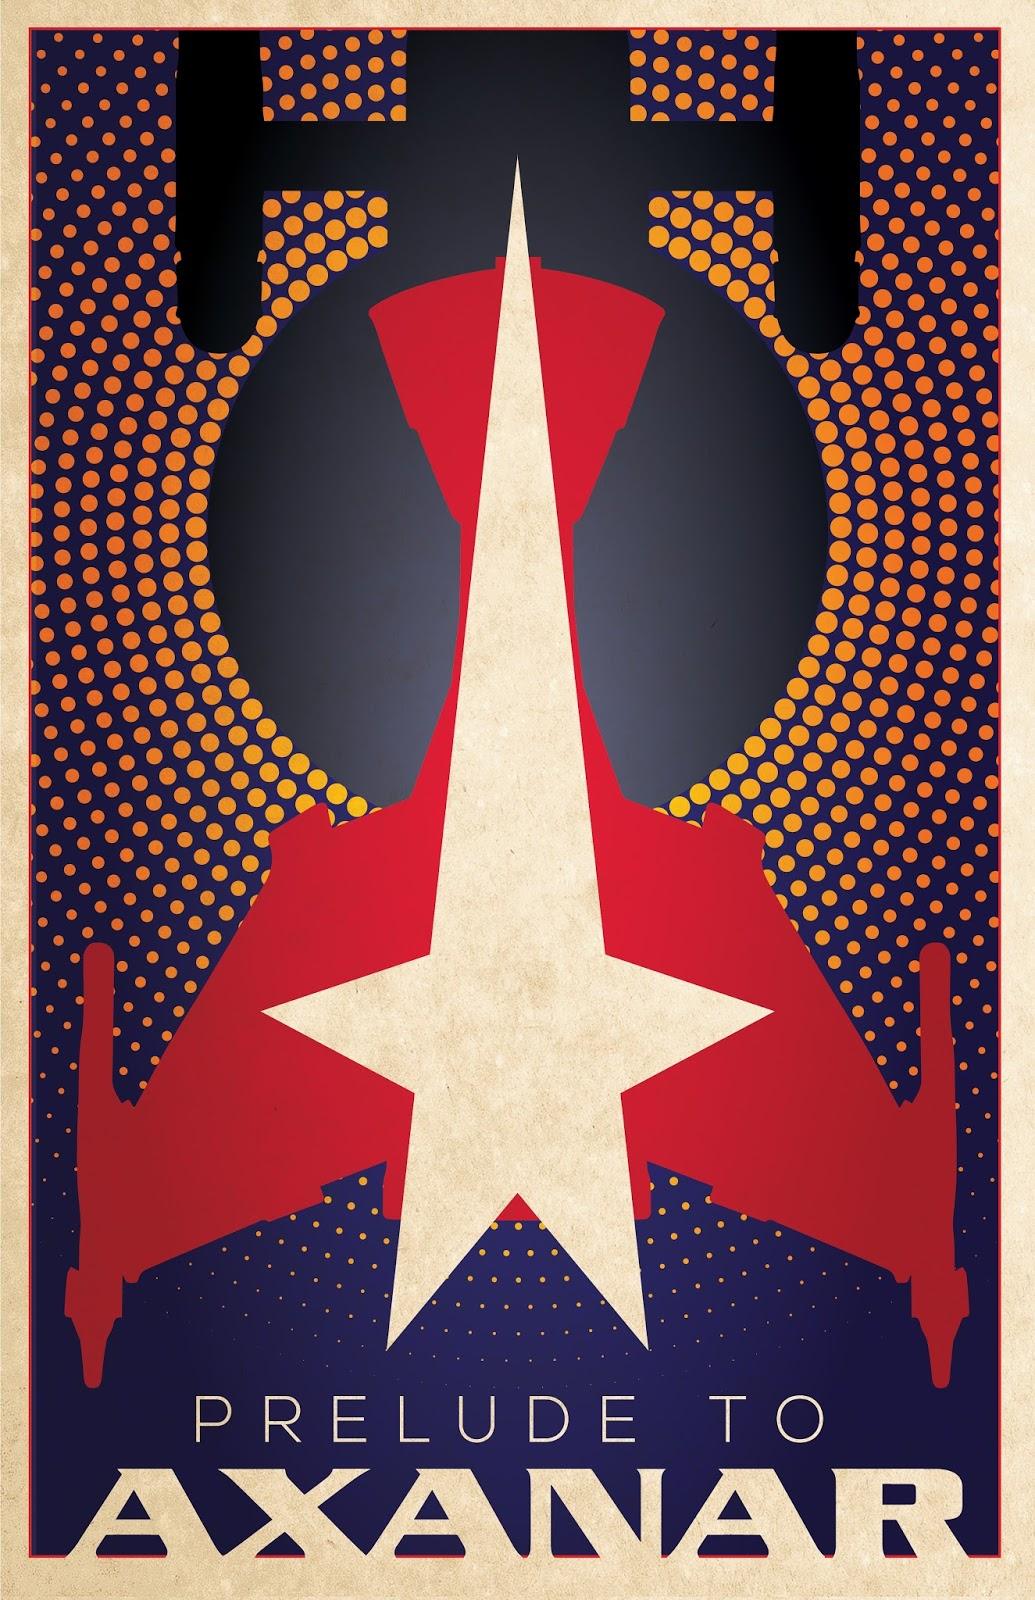 Axanar Poster 1.jpg